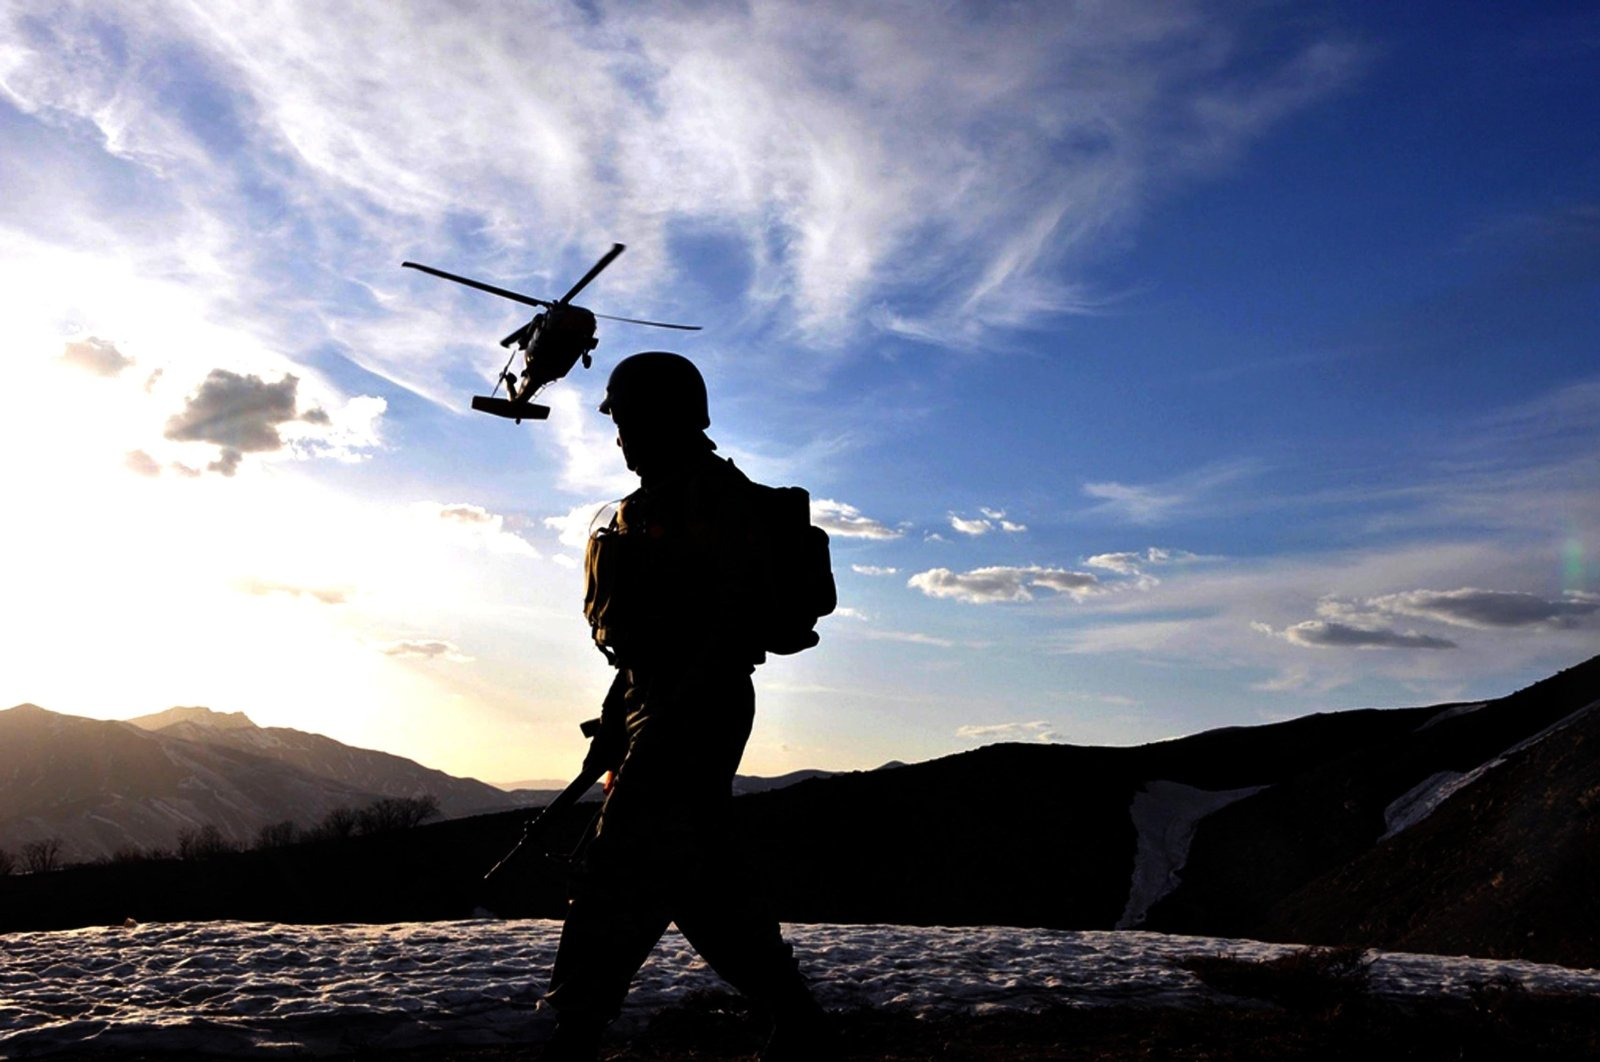 Turkish security forces take part in a counterterrorism operation against PKK terrorists in the Akdağlar area located between Diyarbakır's Lice, Bingöl's Genç and Elazığ's Palu districts, Turkey, April 26, 2019 (AA File Photo)